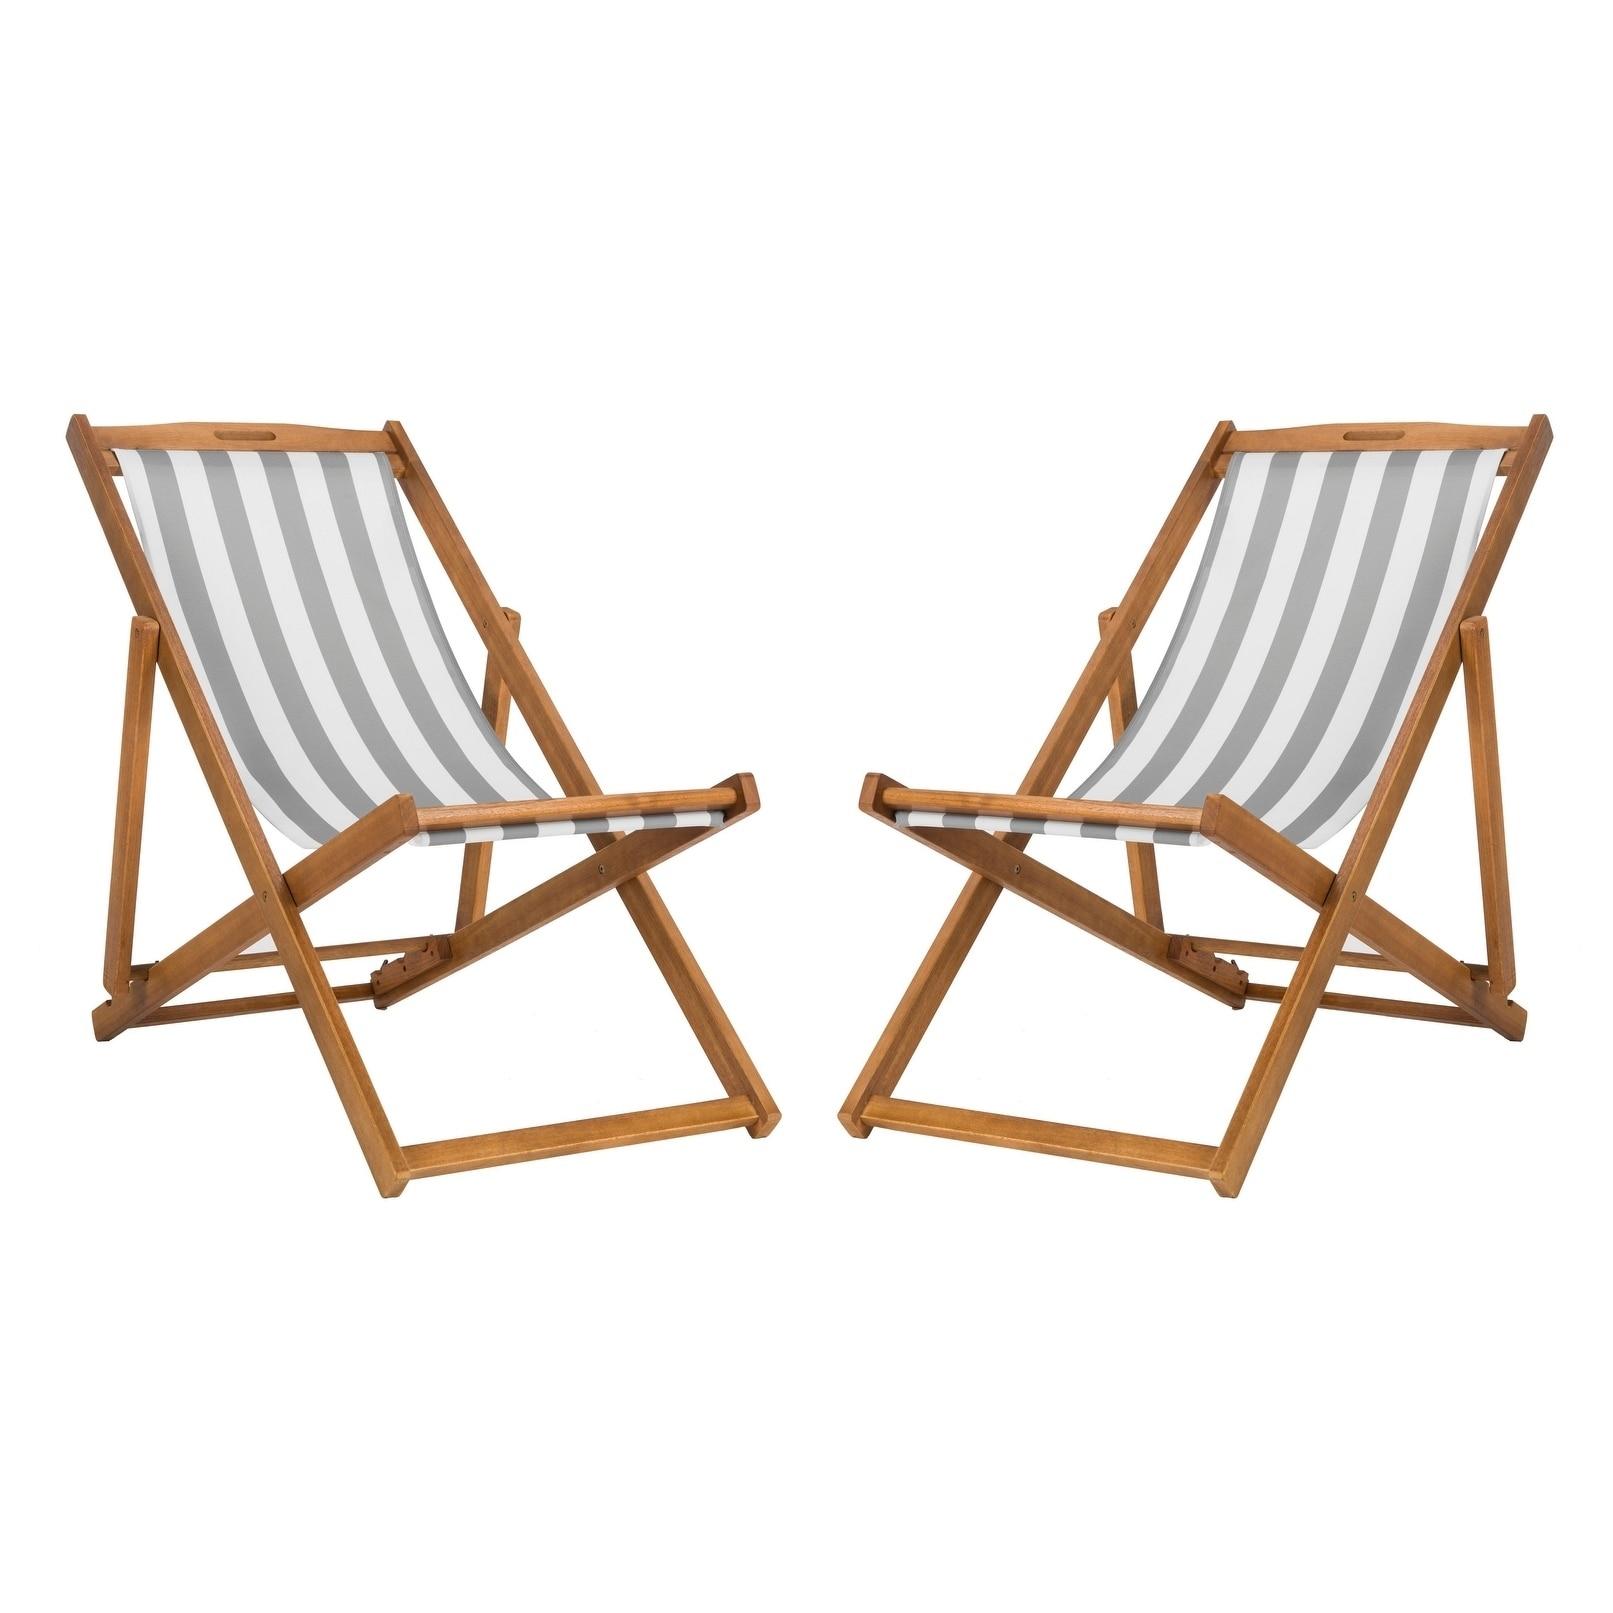 Safavieh Outdoor Living Loren Foldable Sling Chair - Grey /